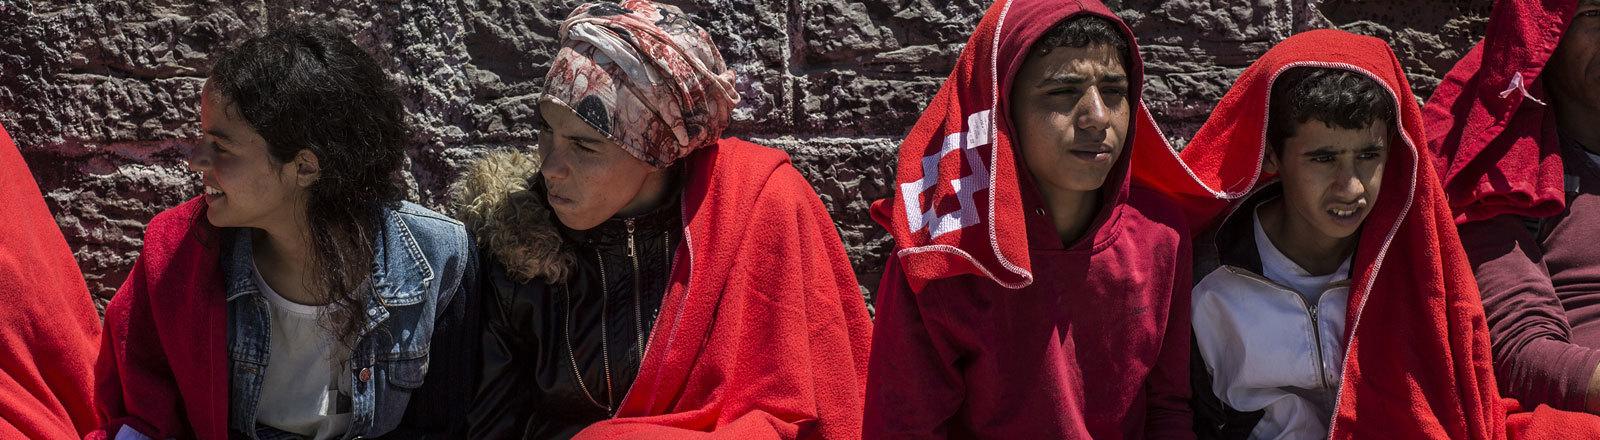 Migranten aus Marokko in Spanien